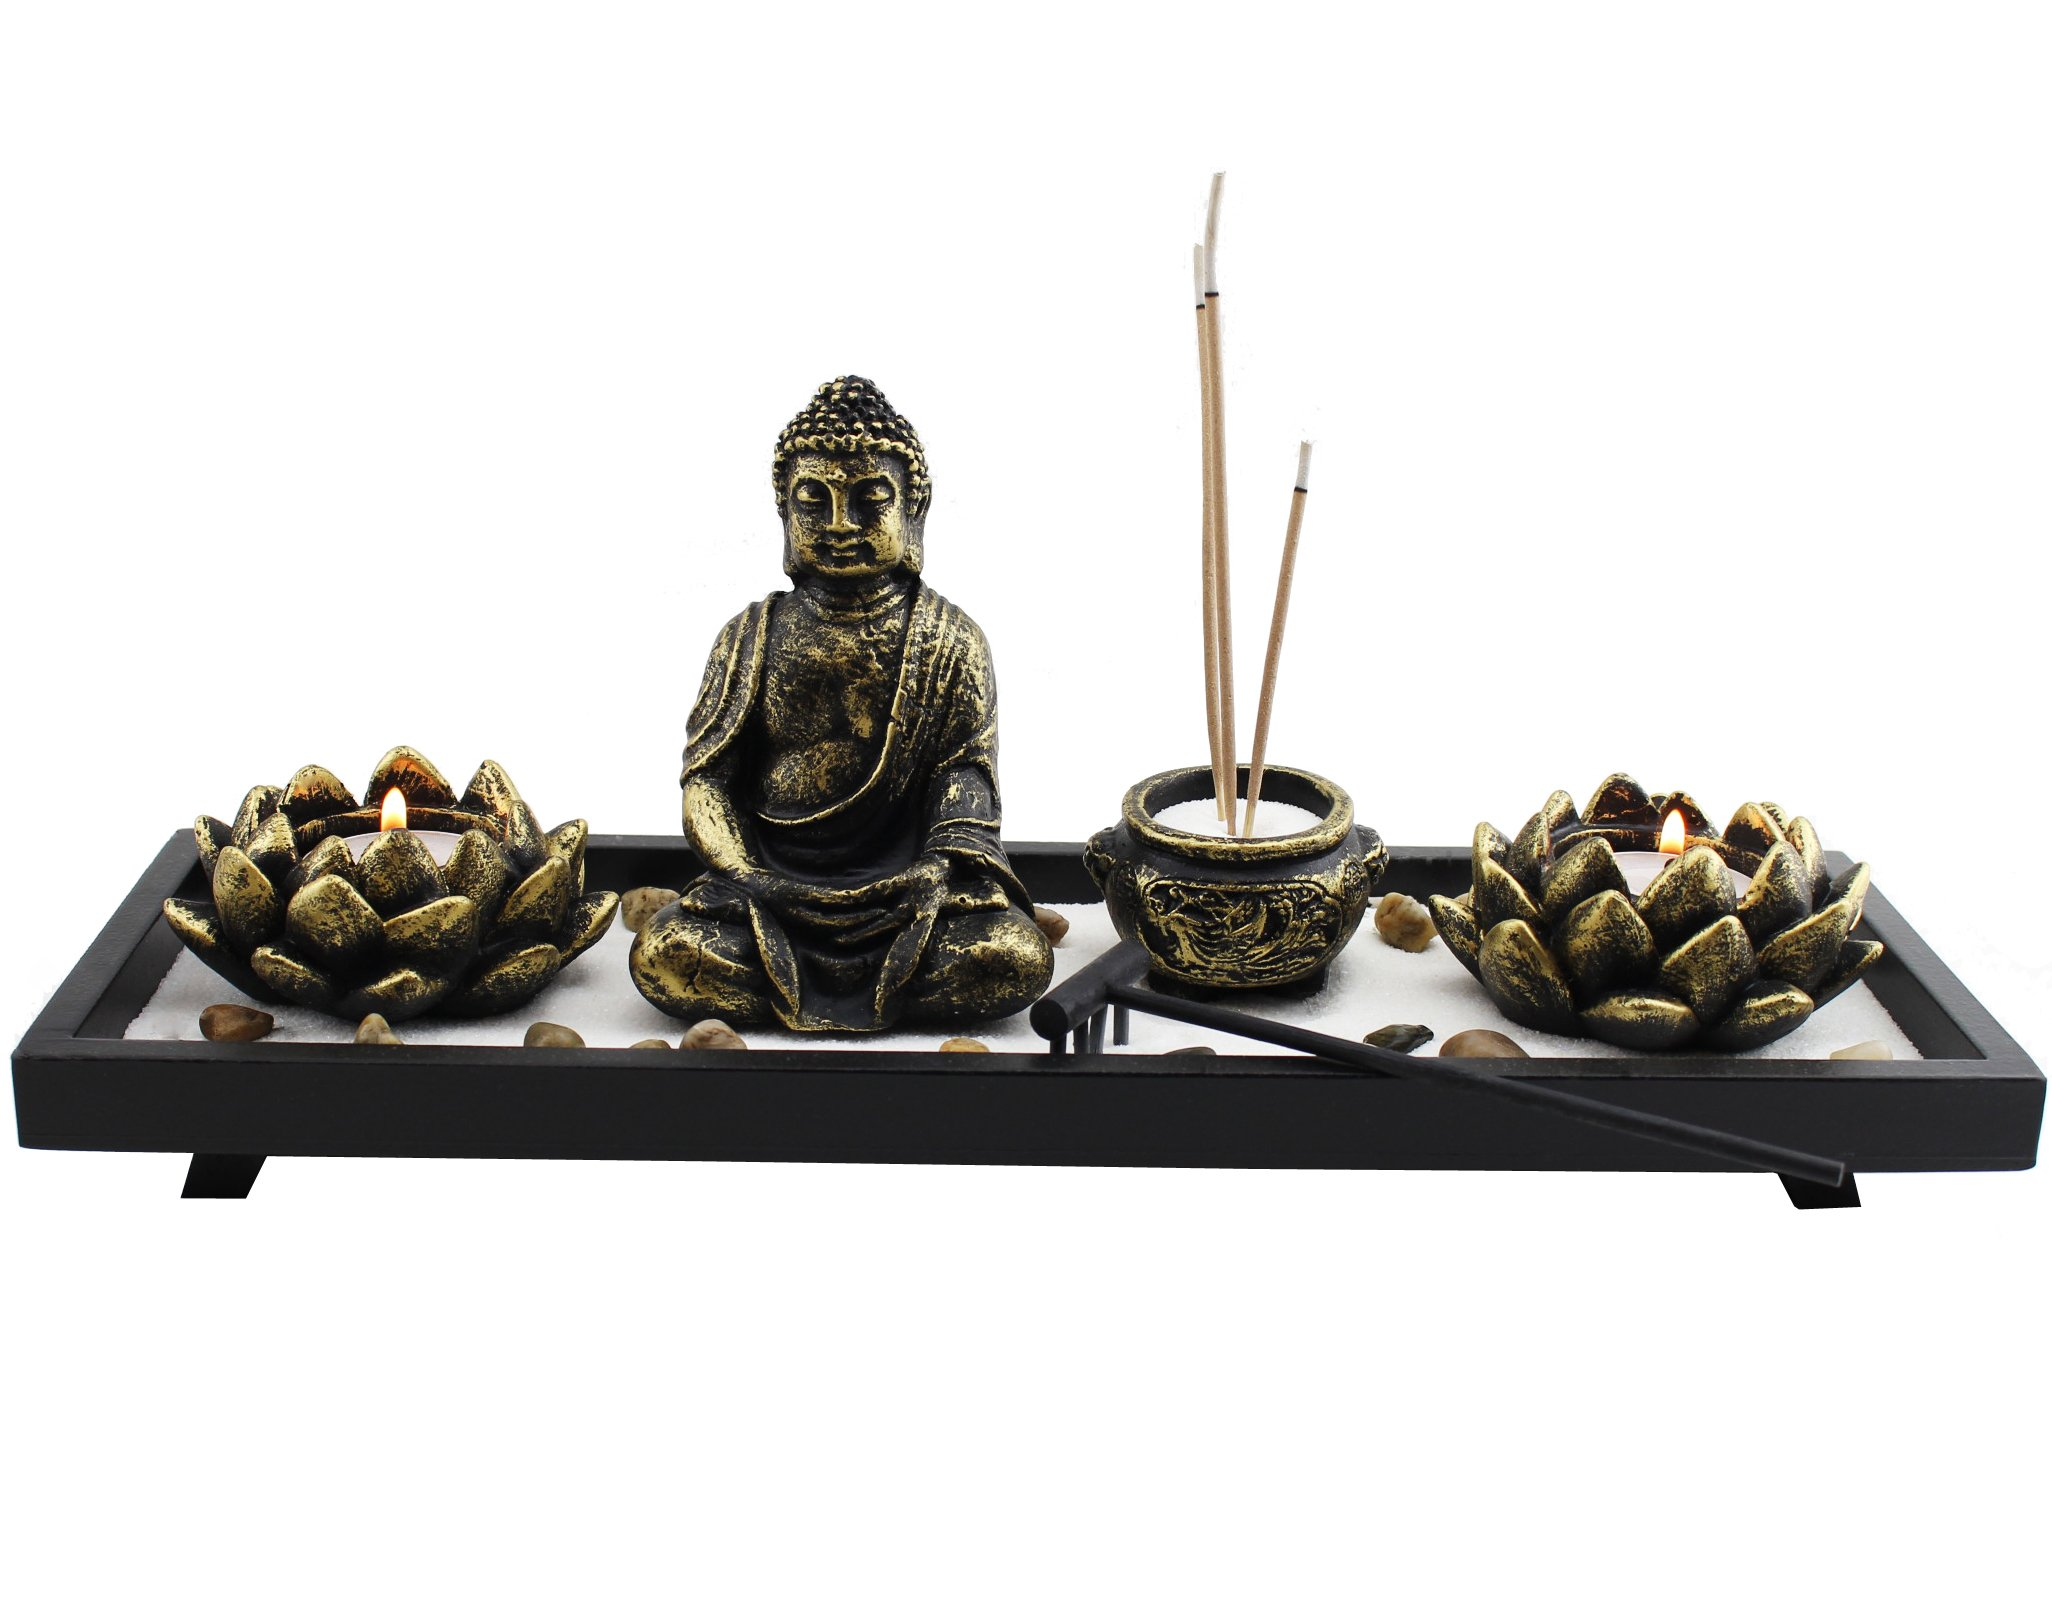 Feng Shui Tabletop Zen Garden Buddha Rock Rake Sand Candle Incense Burner Home Decor Gift (KT00034) ~ We Pay Your Sales Tax by We pay your sales tax